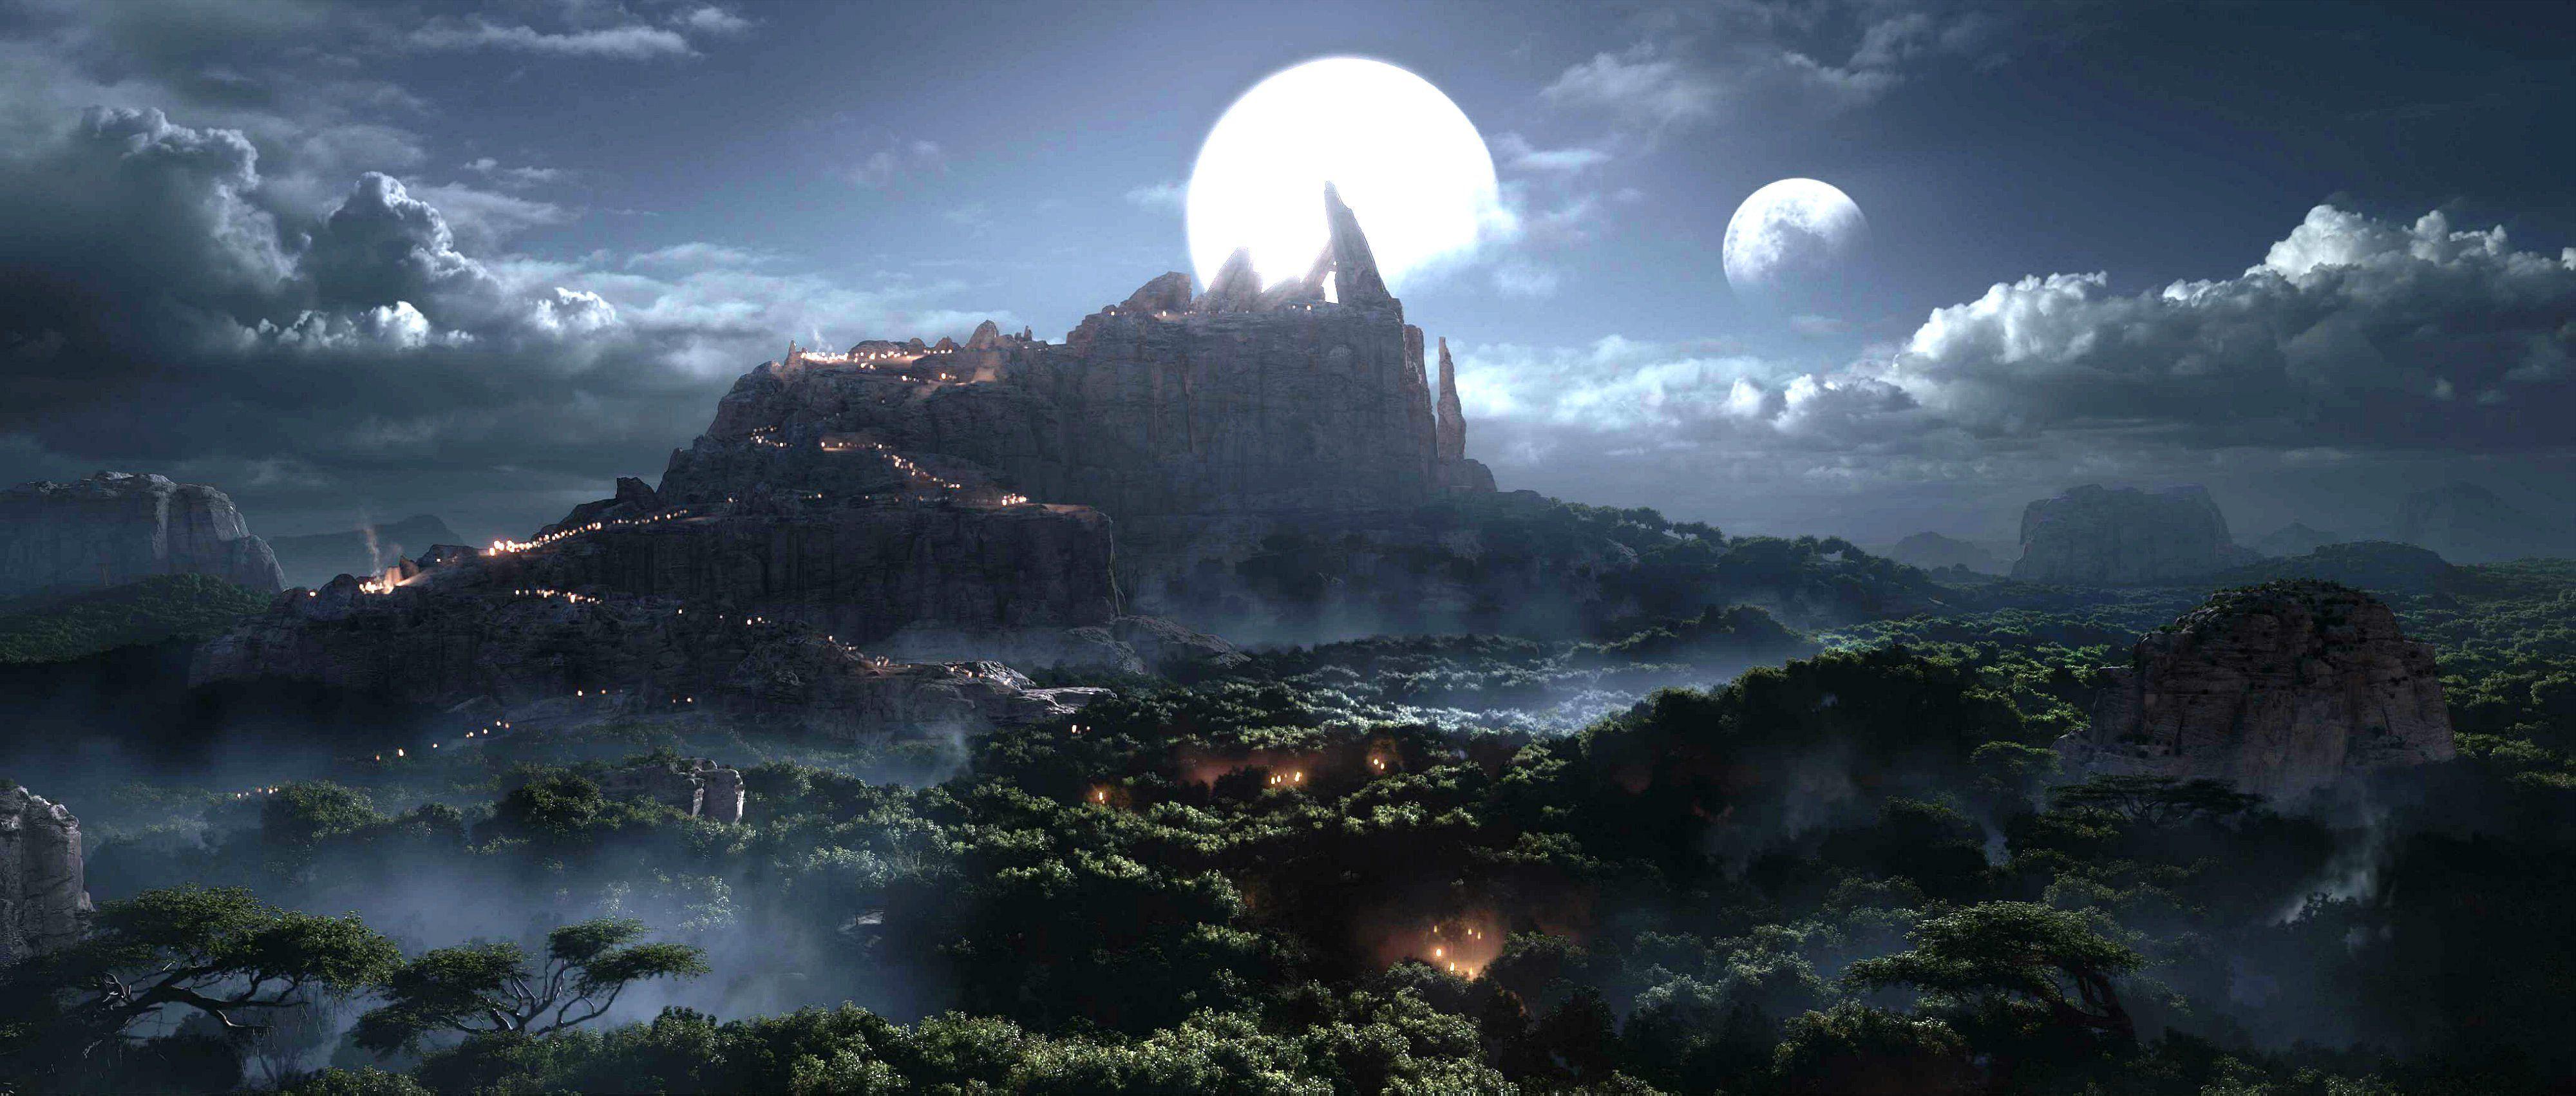 World Of Warcraft HD Обои Фоны Wallpaper Обои, Фон